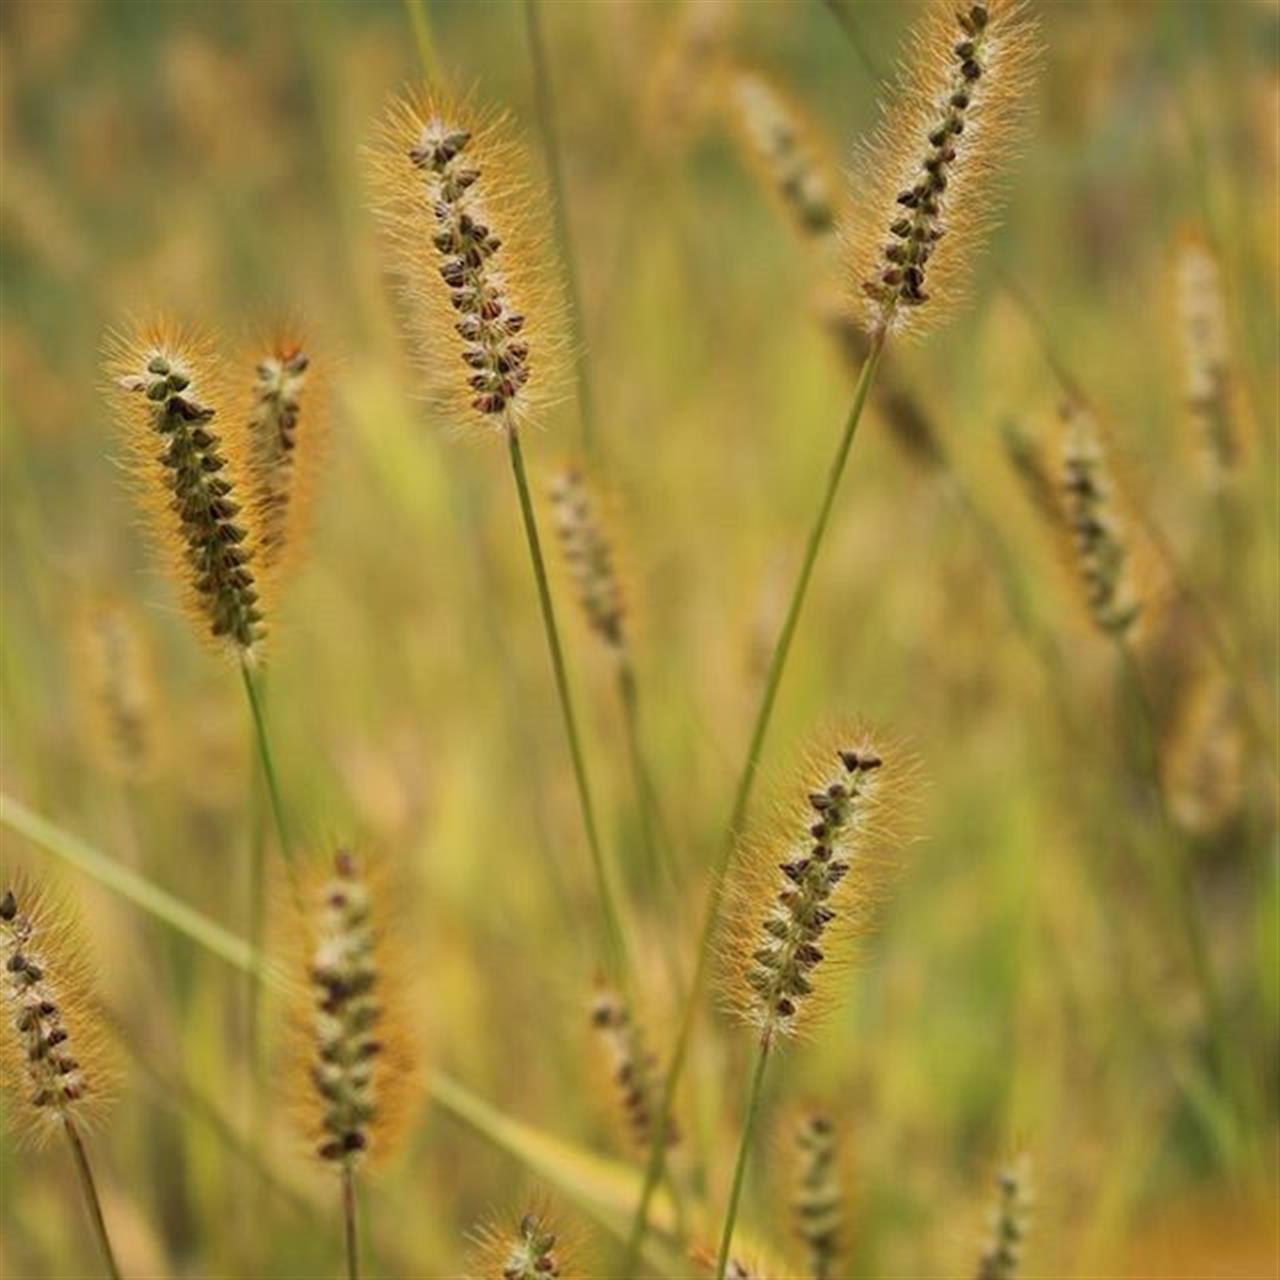 #upstateny #stuartsapplefarm  #grass